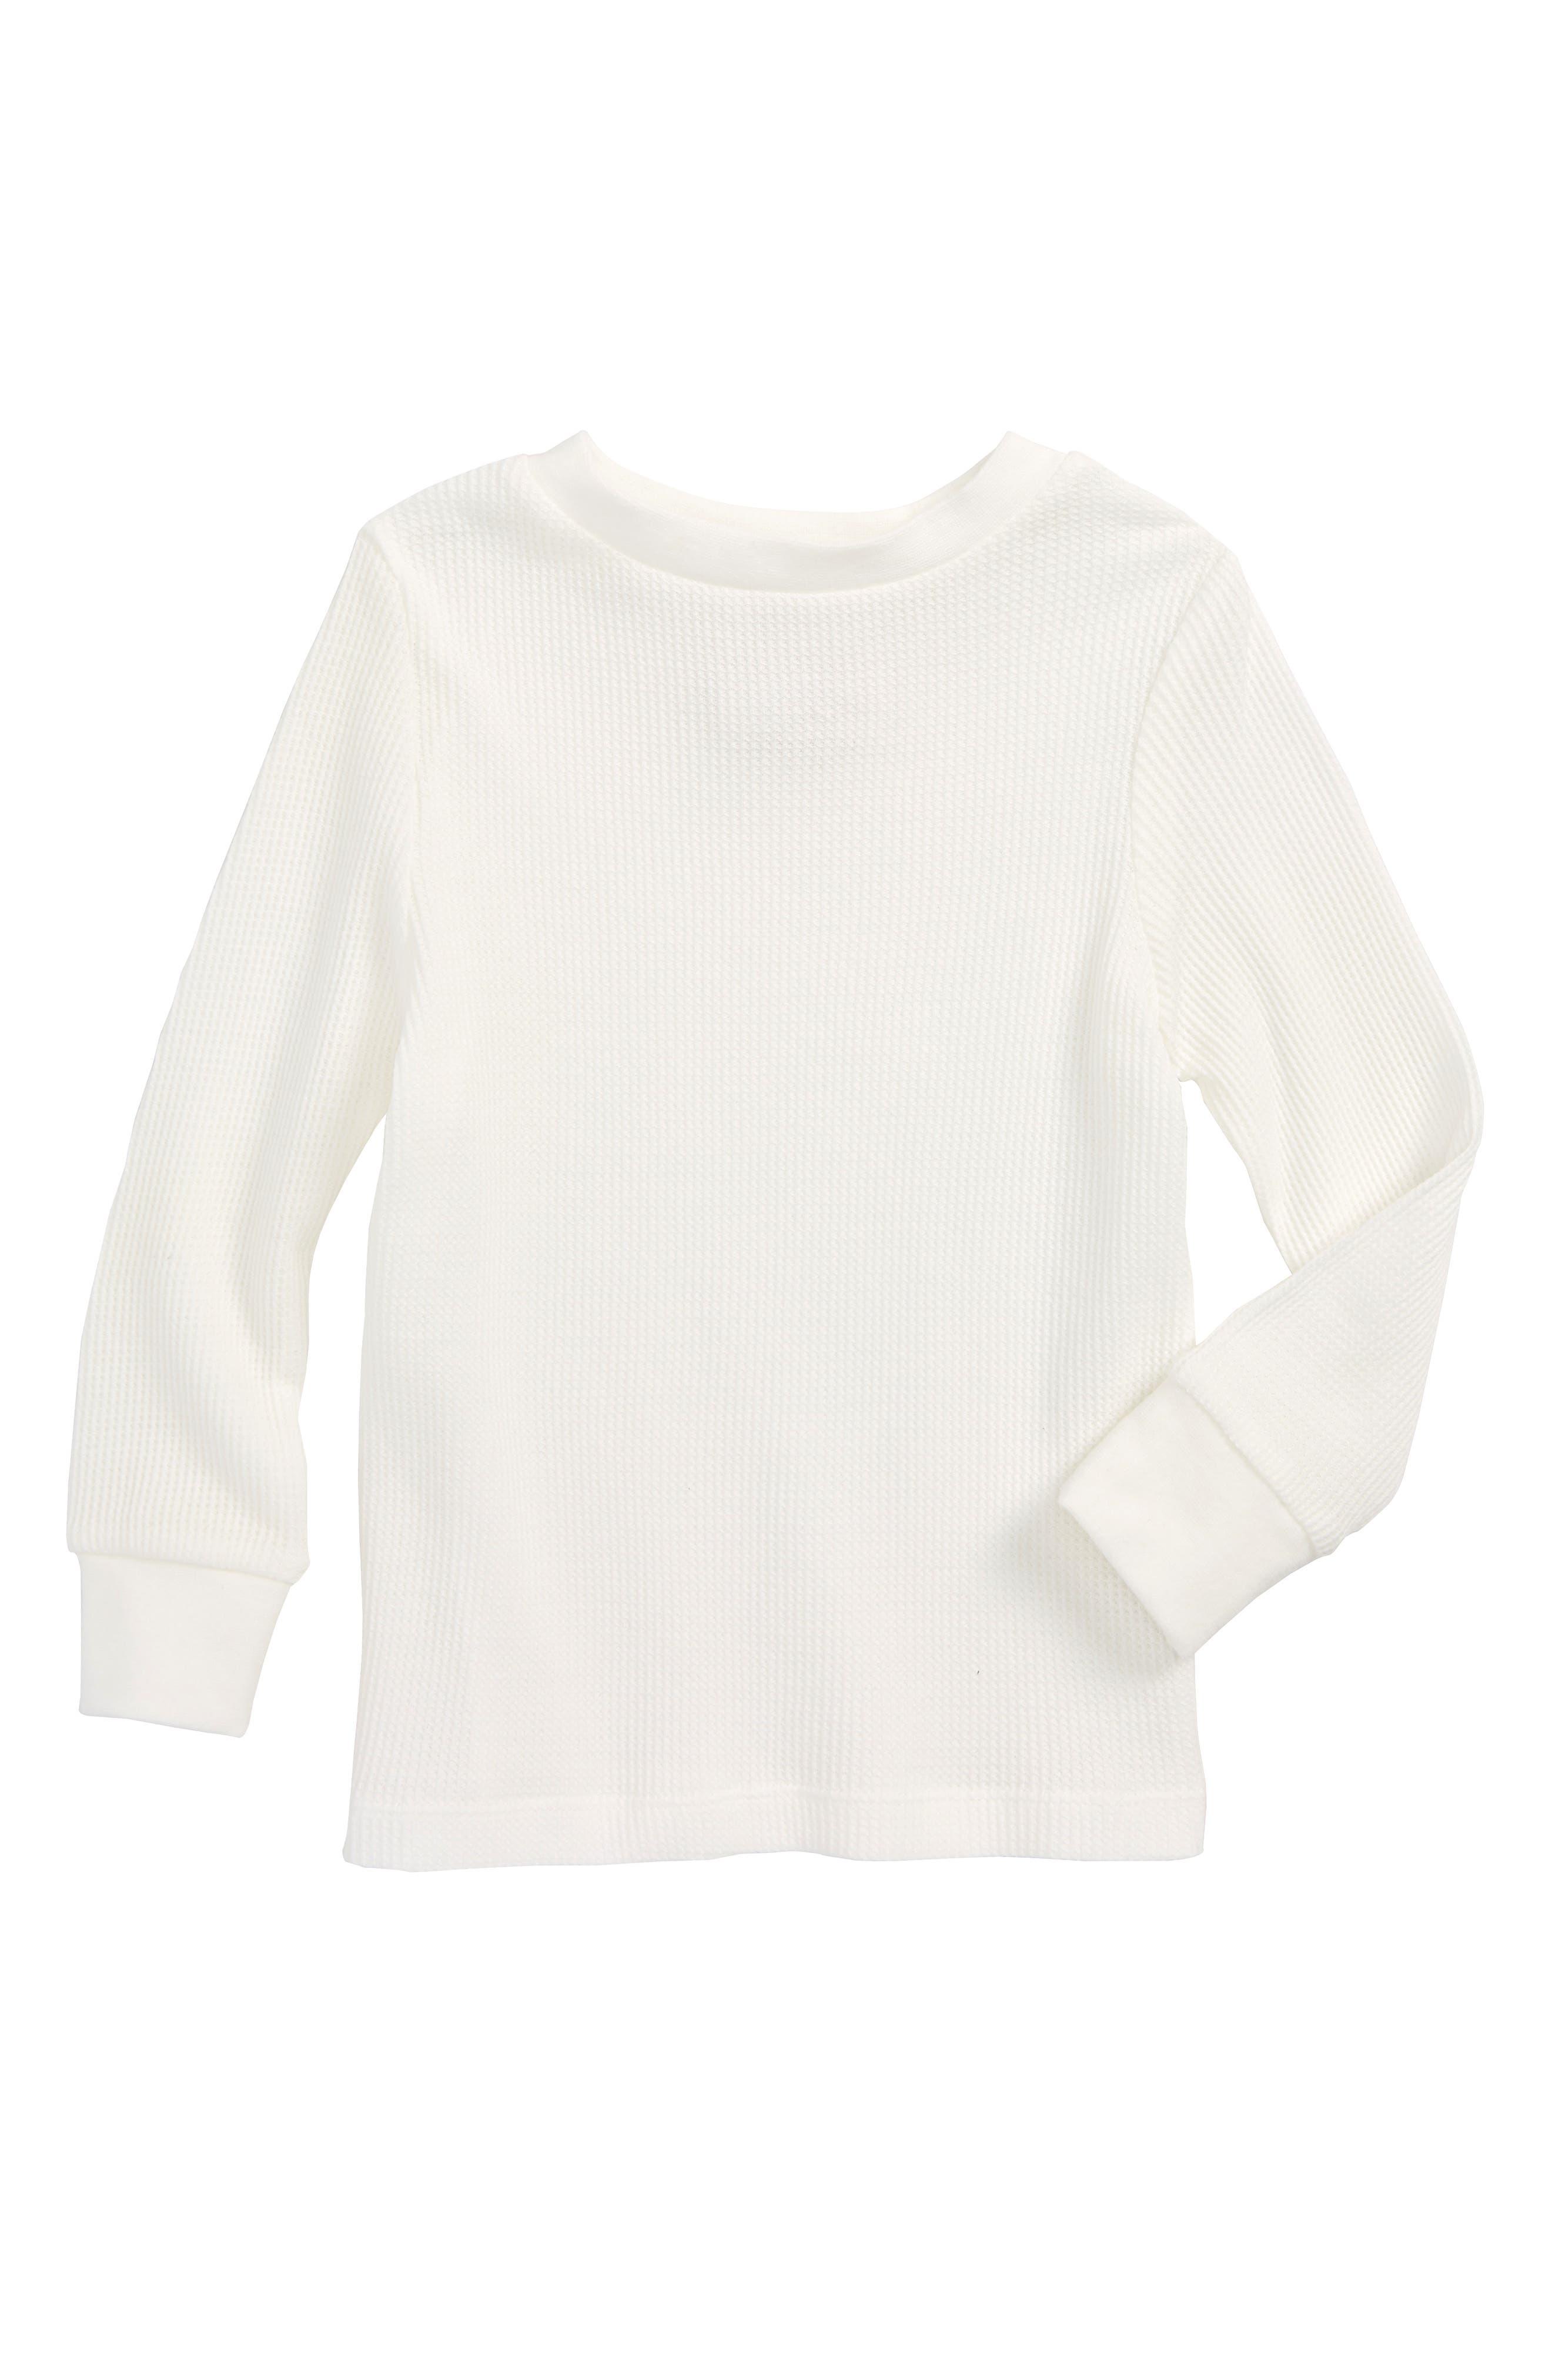 Main Image - Peek Thermal T-Shirt (Toddler Boys, Little Boys & Big Boys)